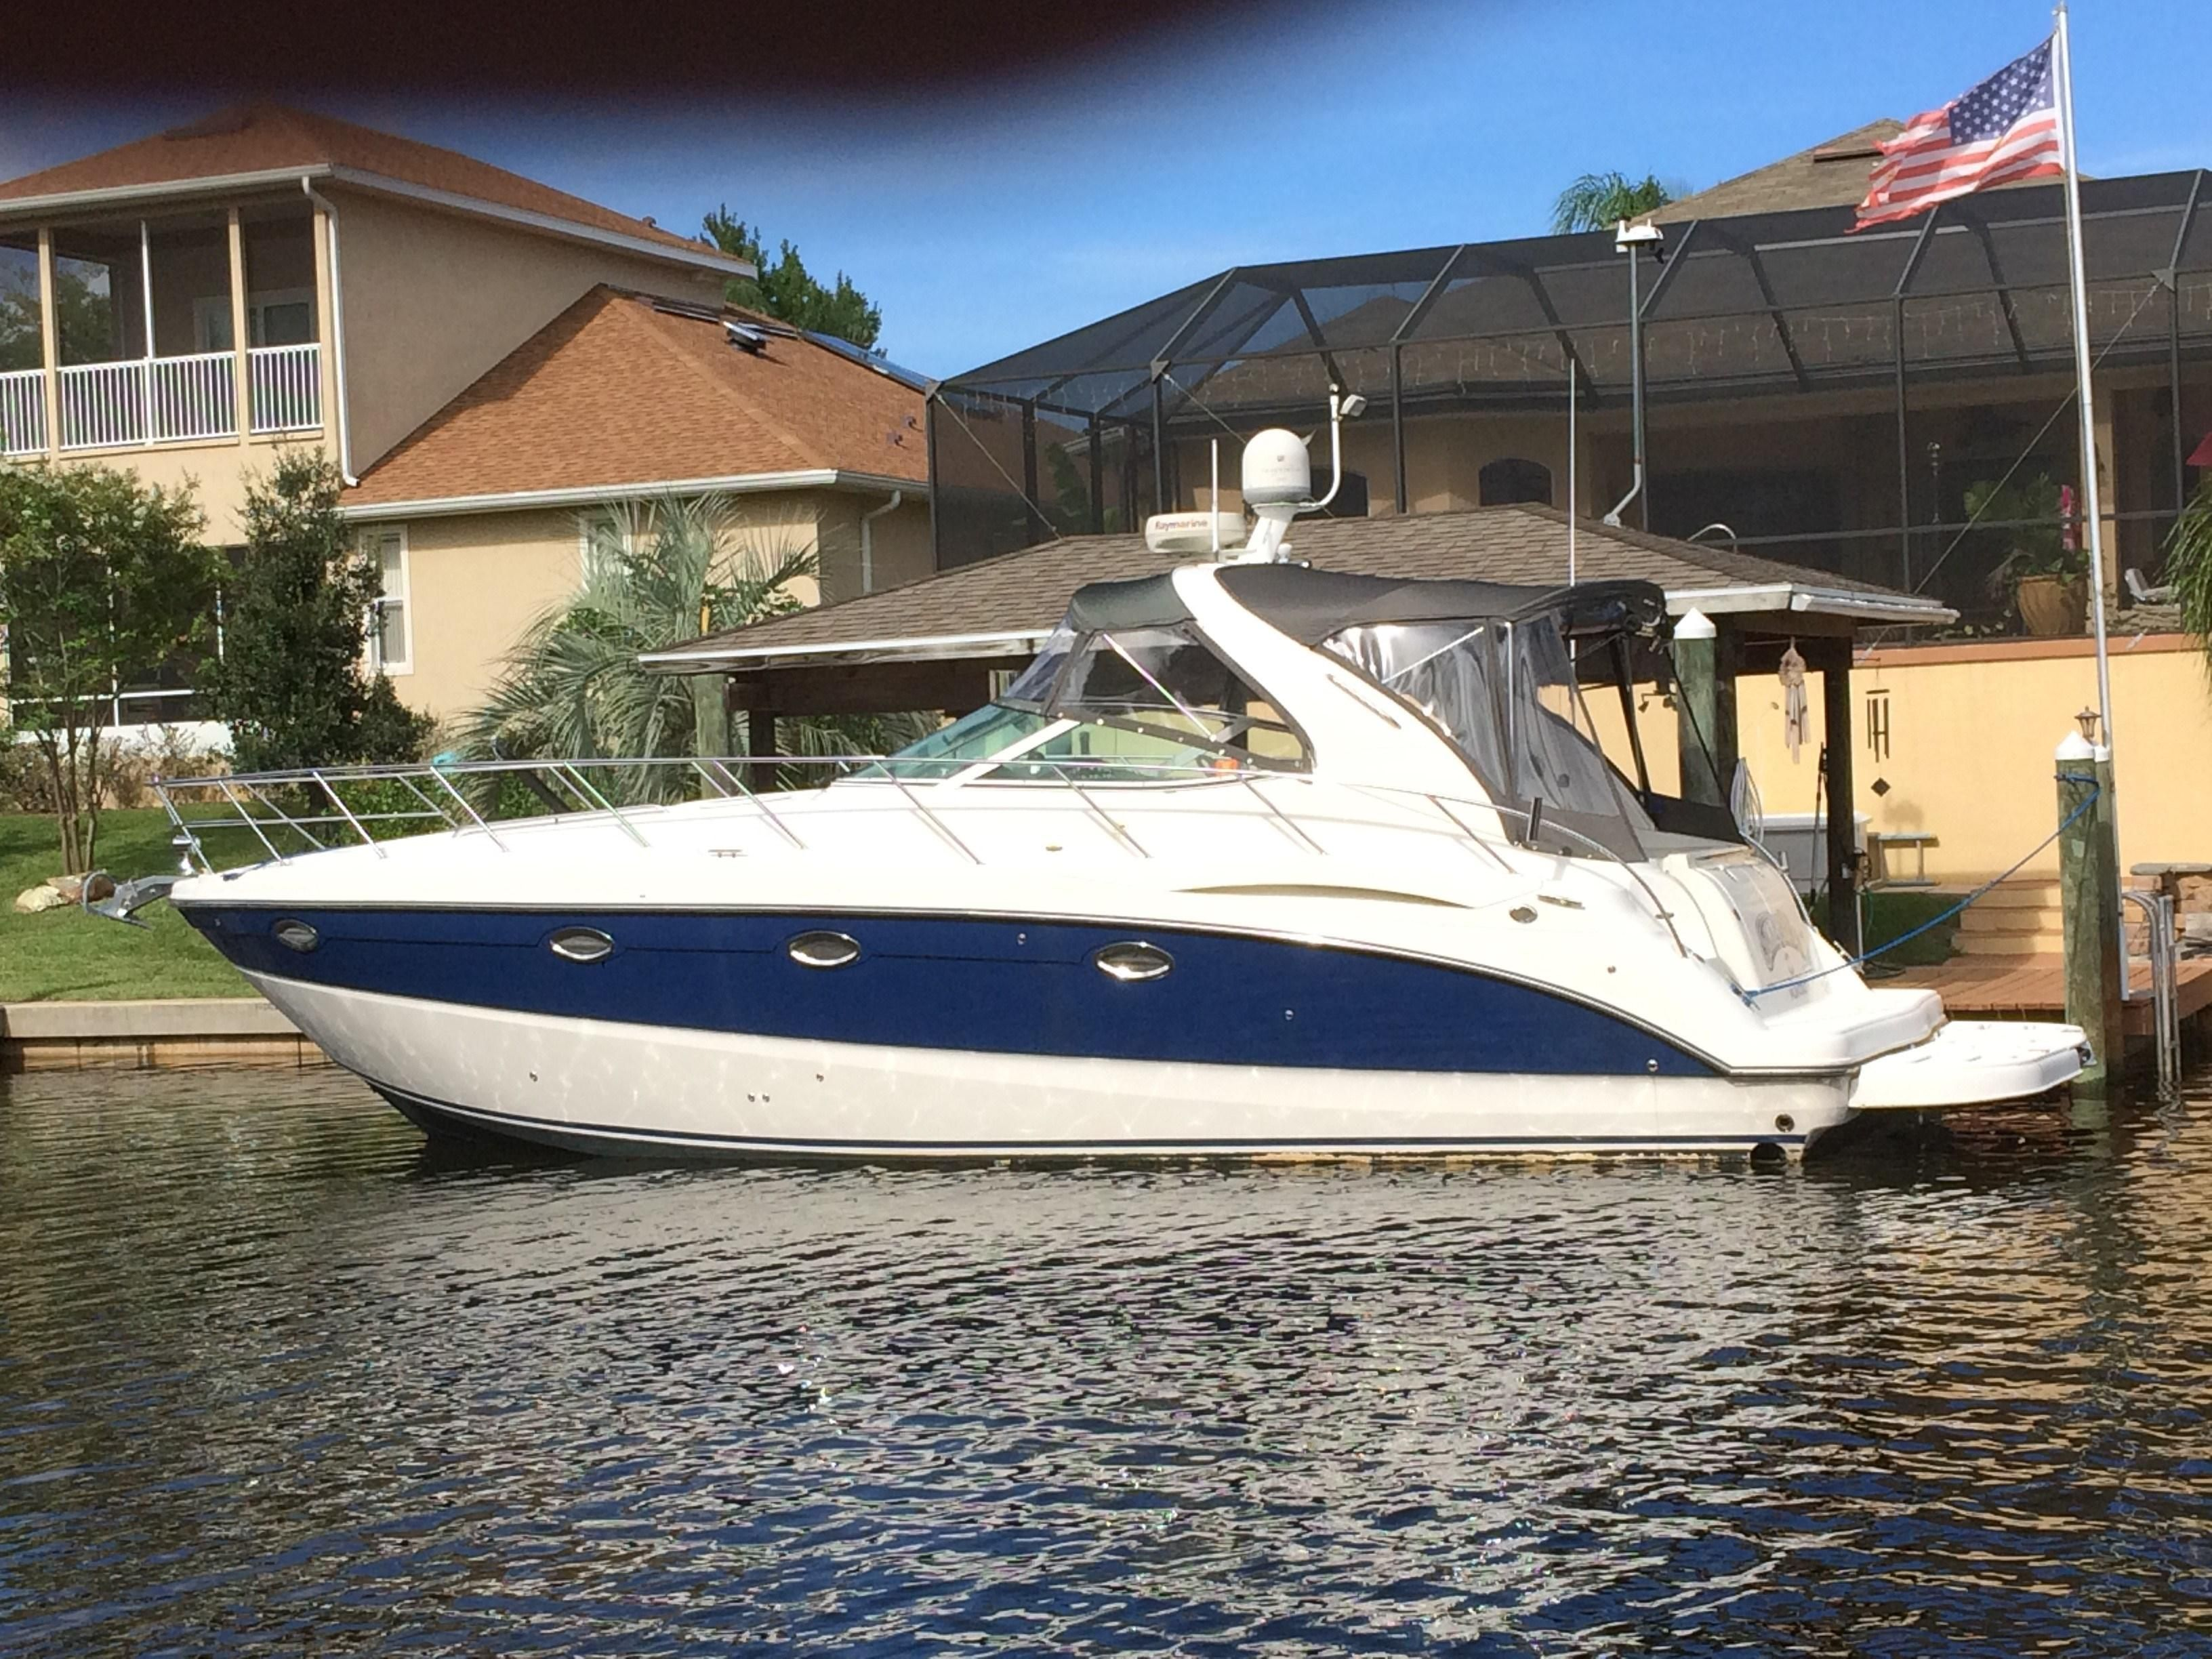 2005 Maxum 3700 SY Power Boat For Sale - www.yachtworld.com